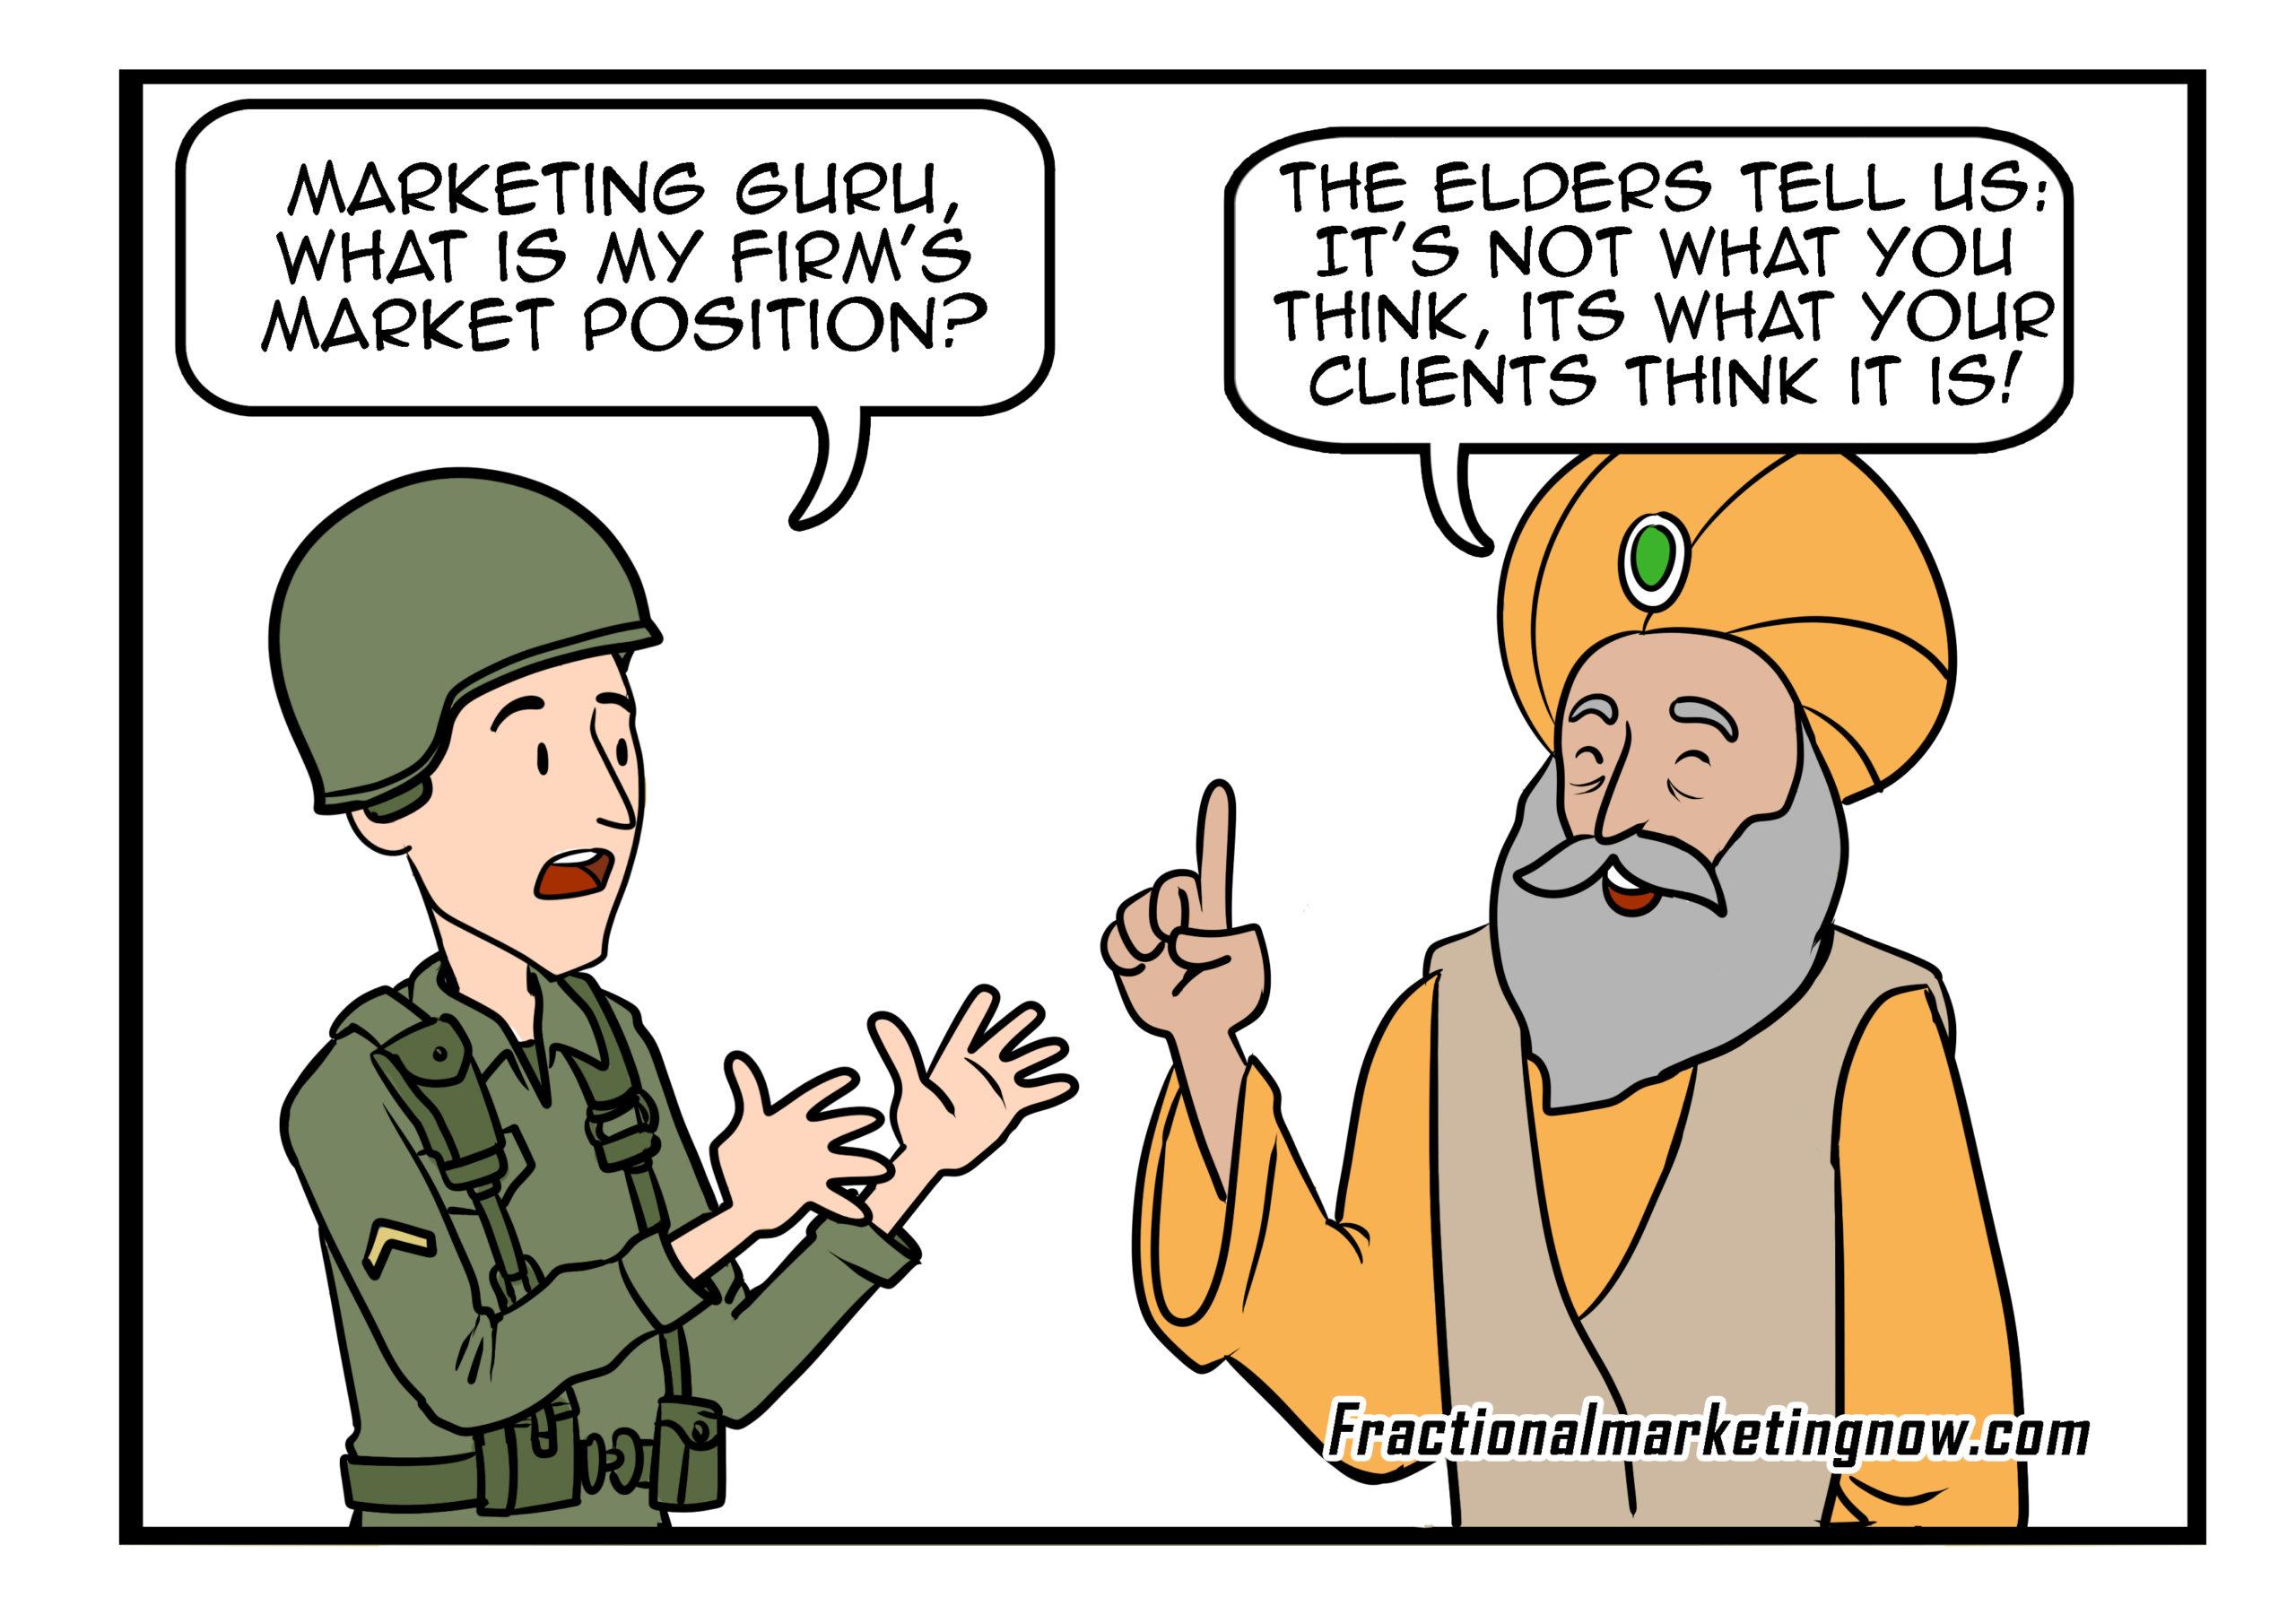 Marketing guru market position